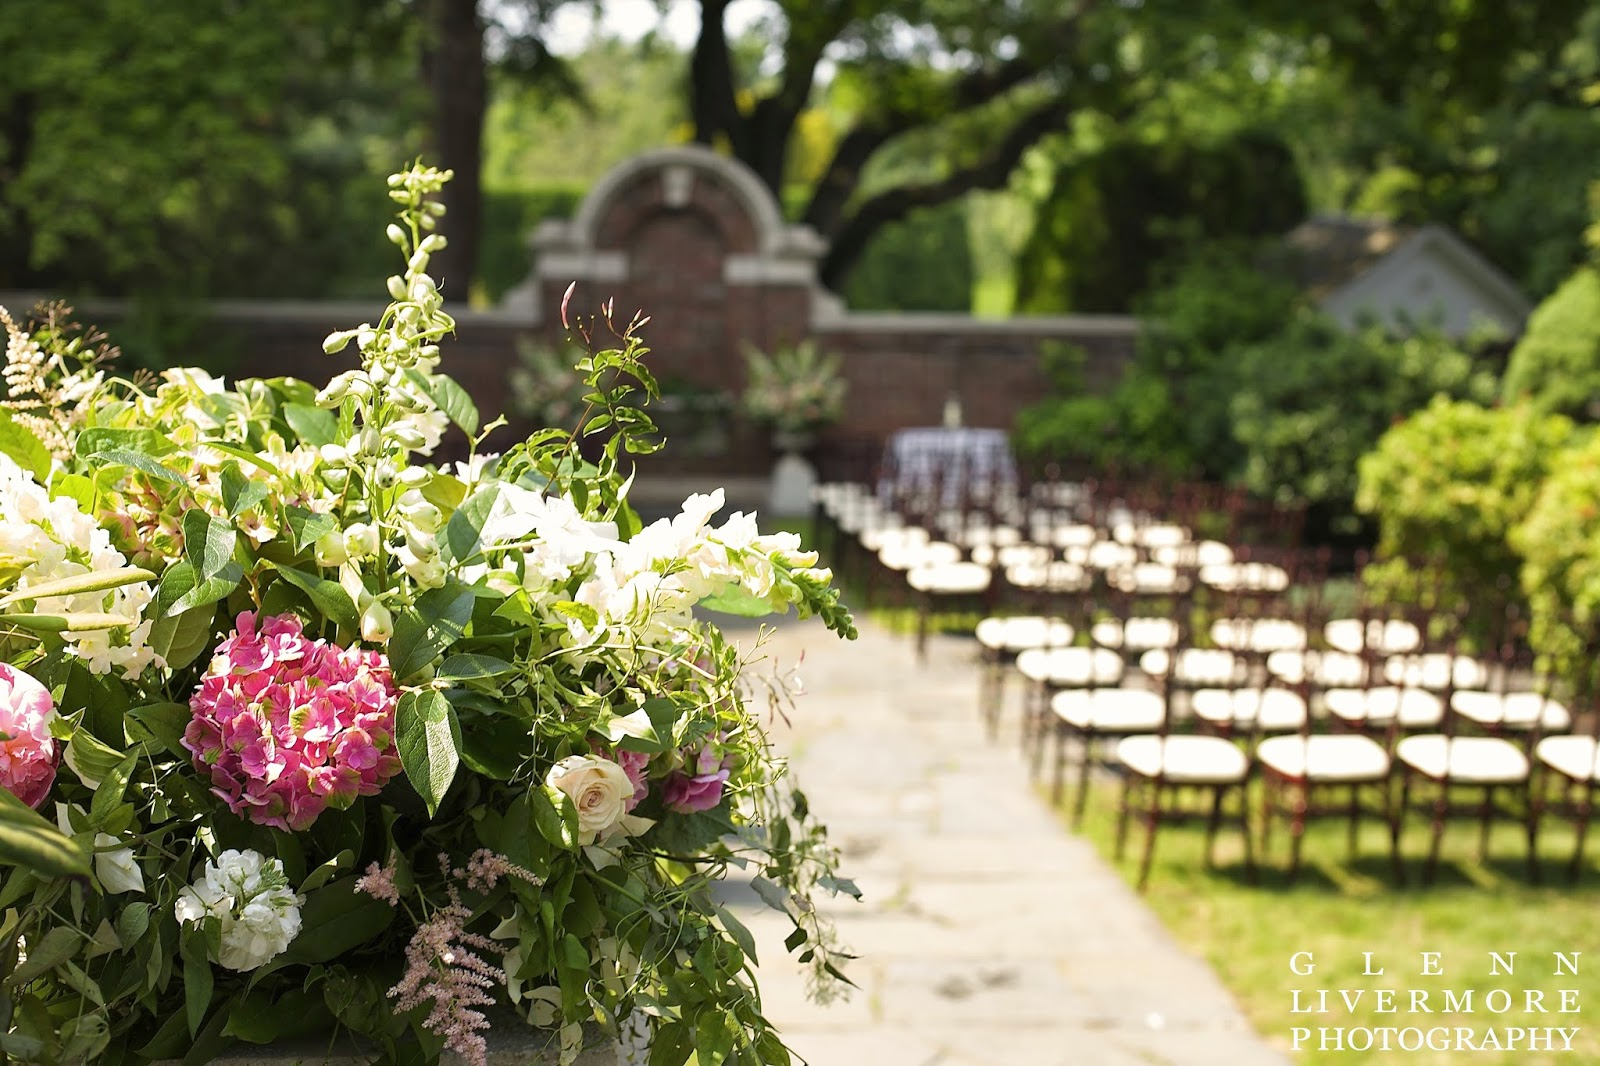 glenn livermore photography : les fleurs : lanam club : garden ceremony